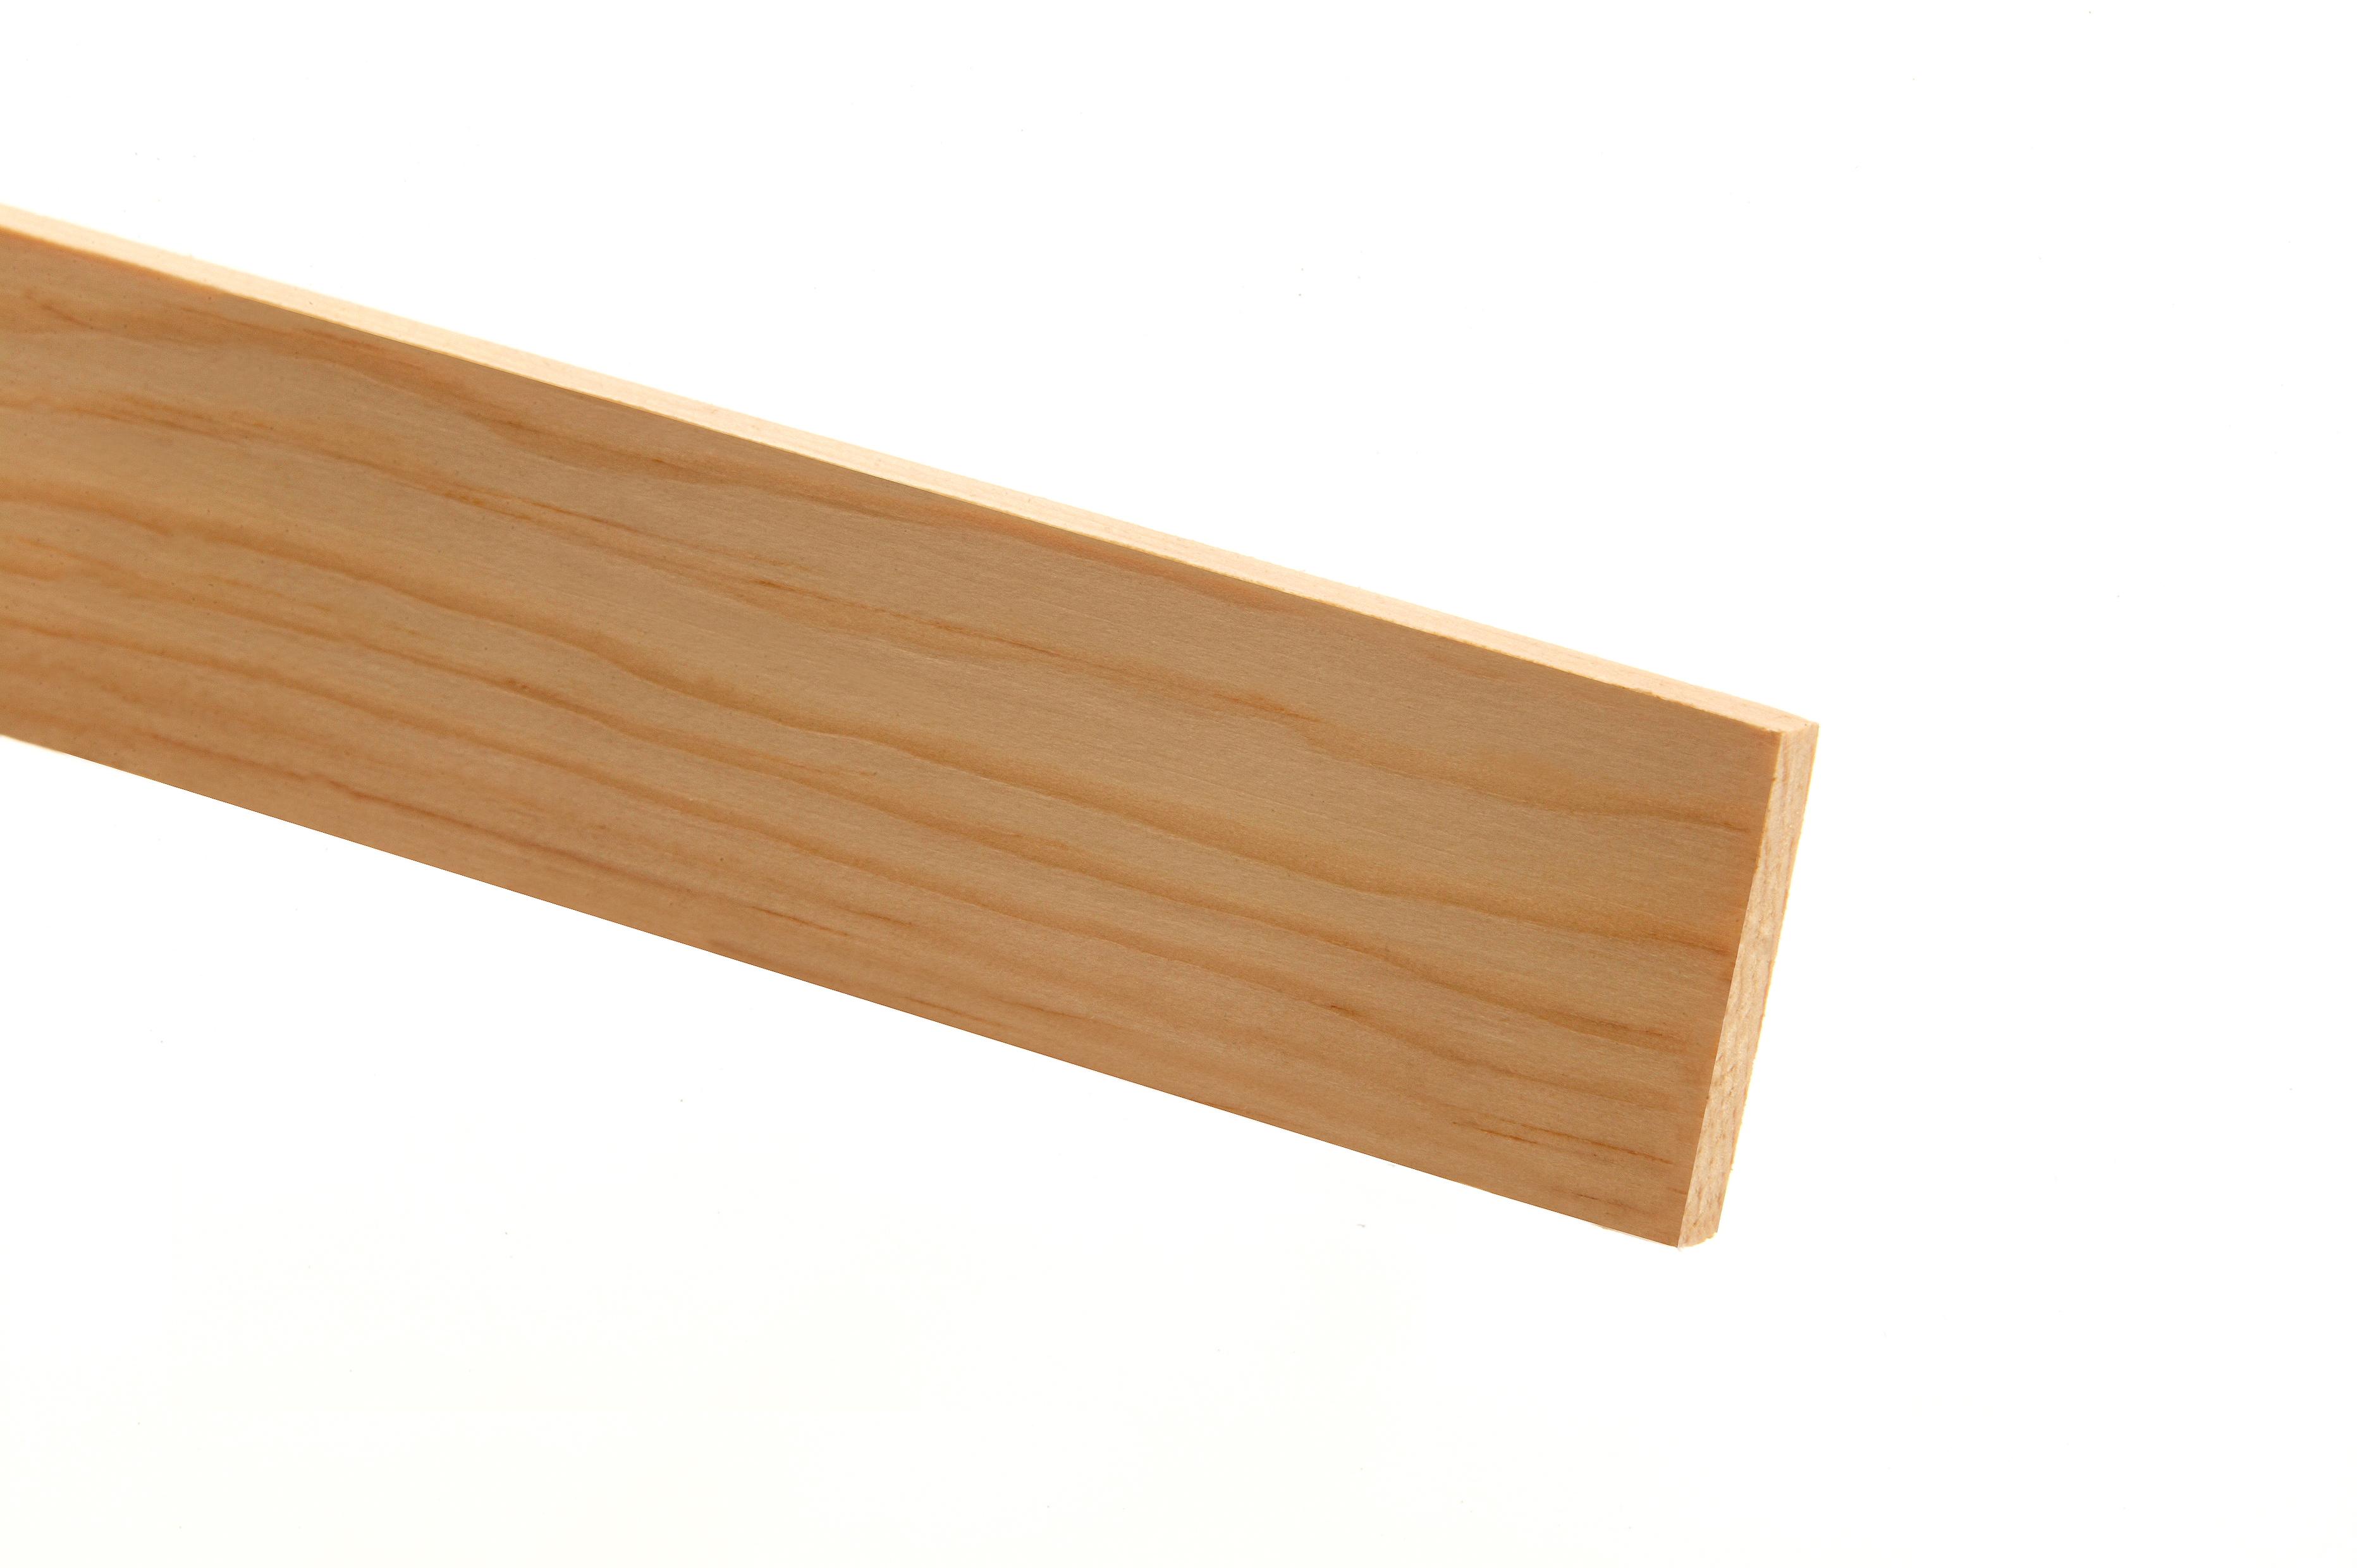 5 Pine PSE Stripwood 46 x 71 x 2400mm